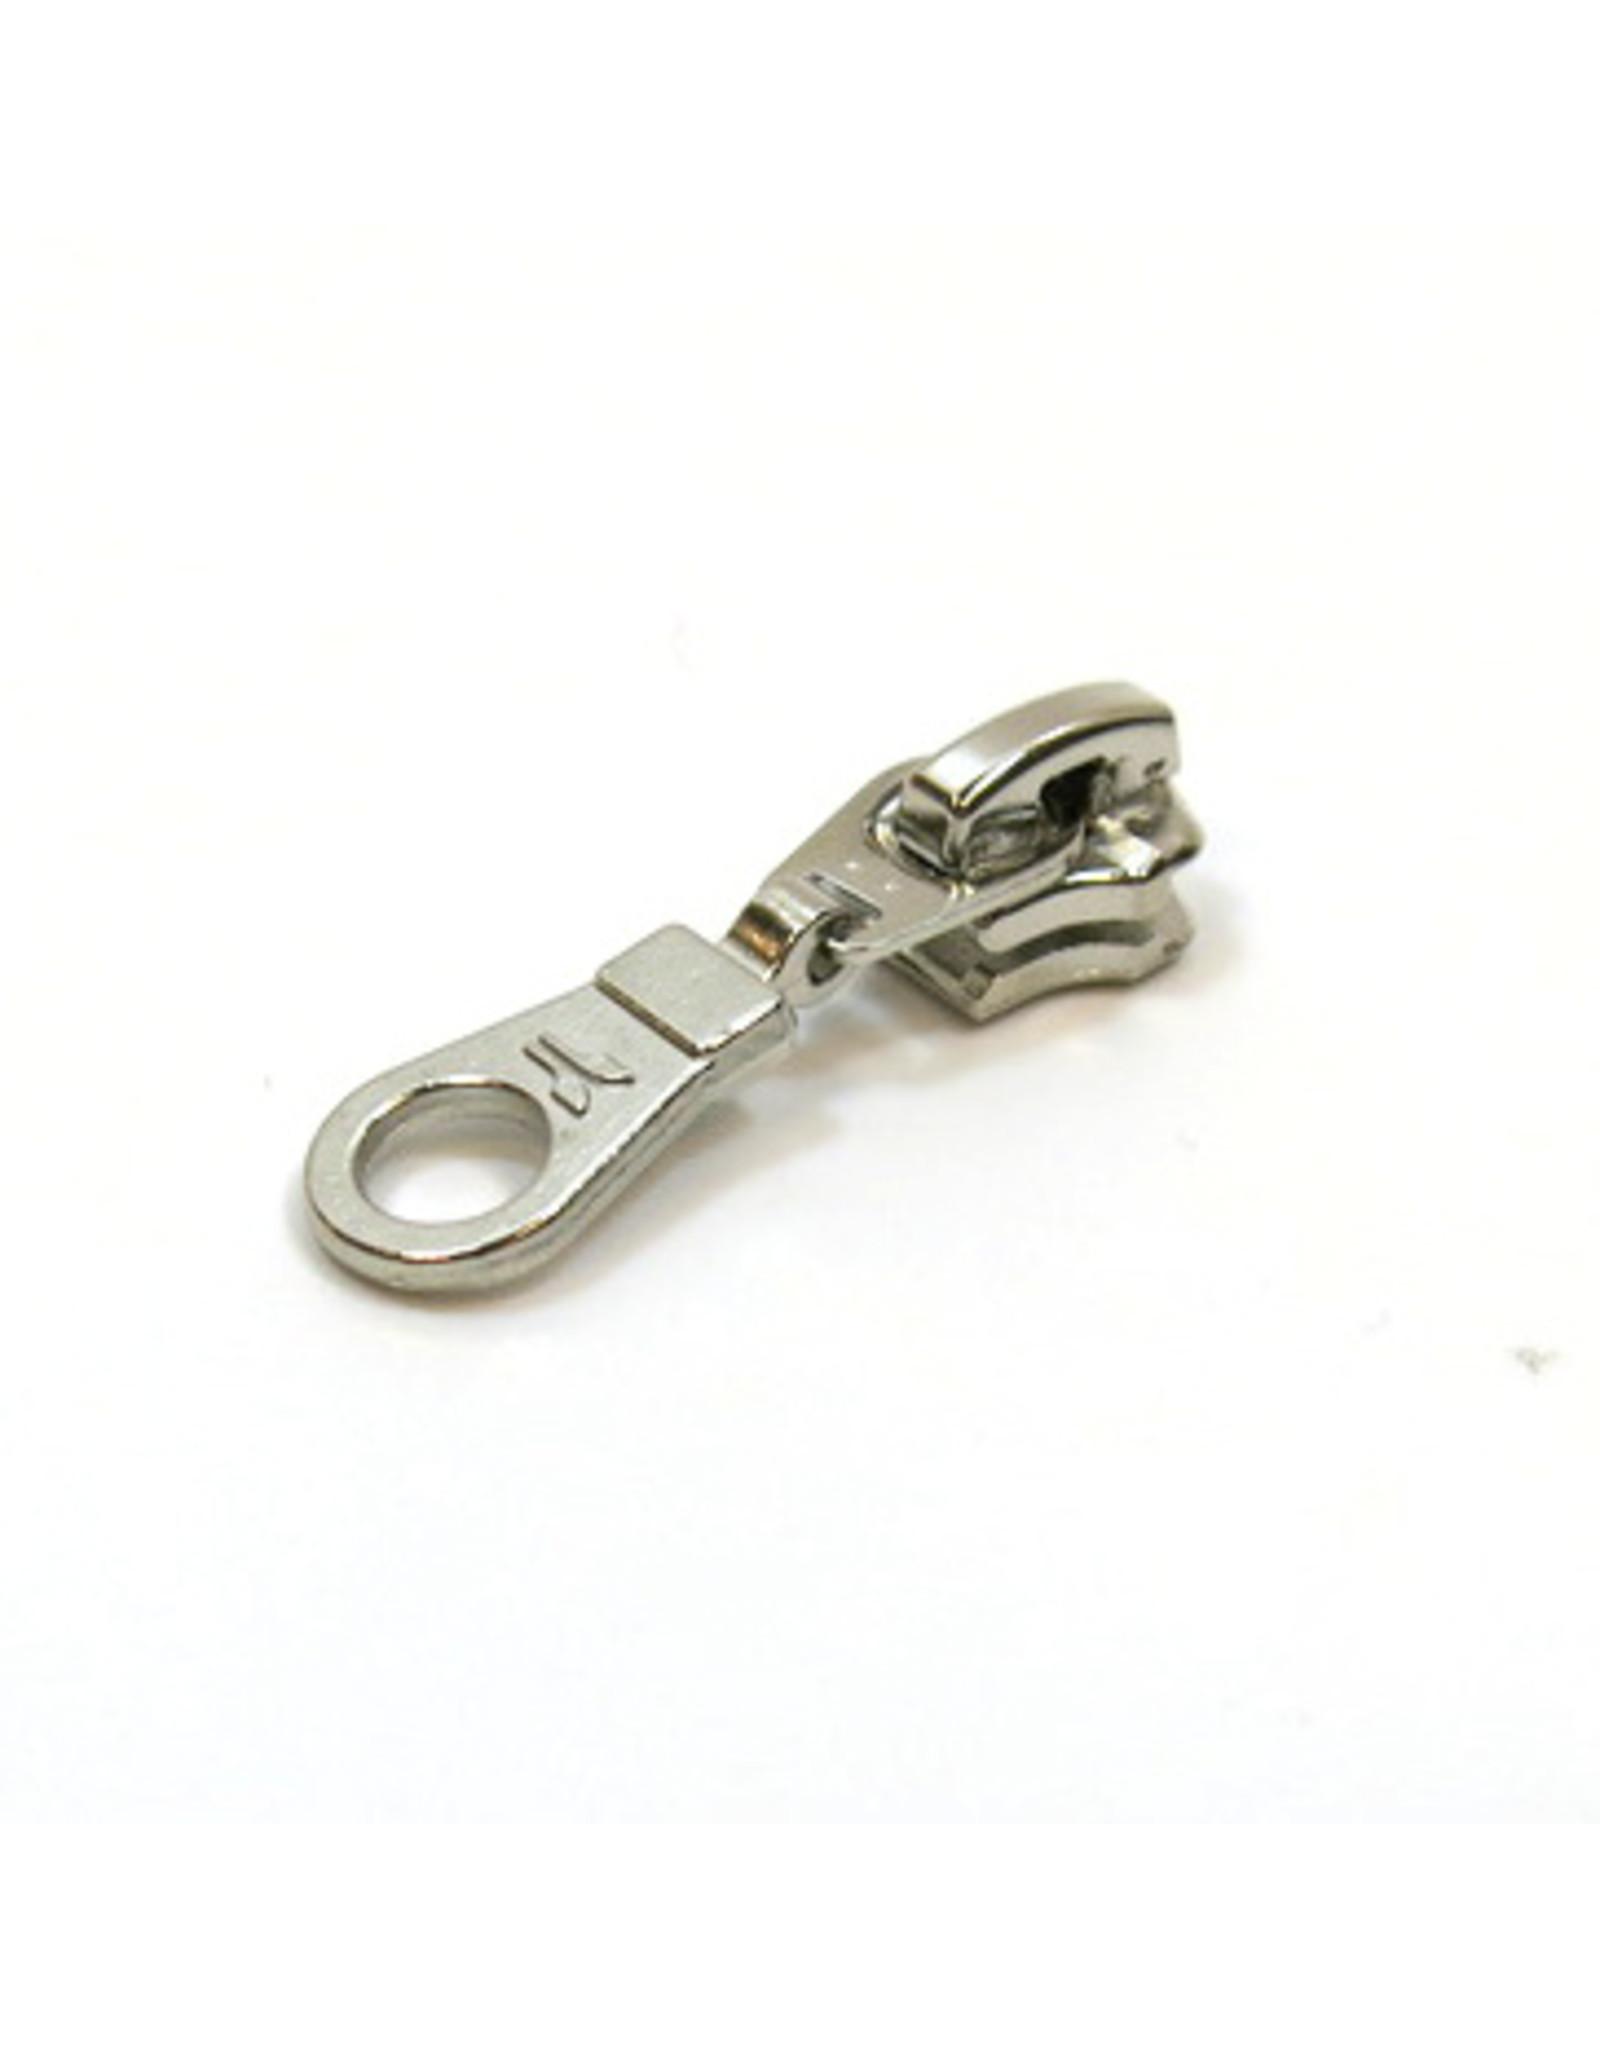 Zipper pull nickel